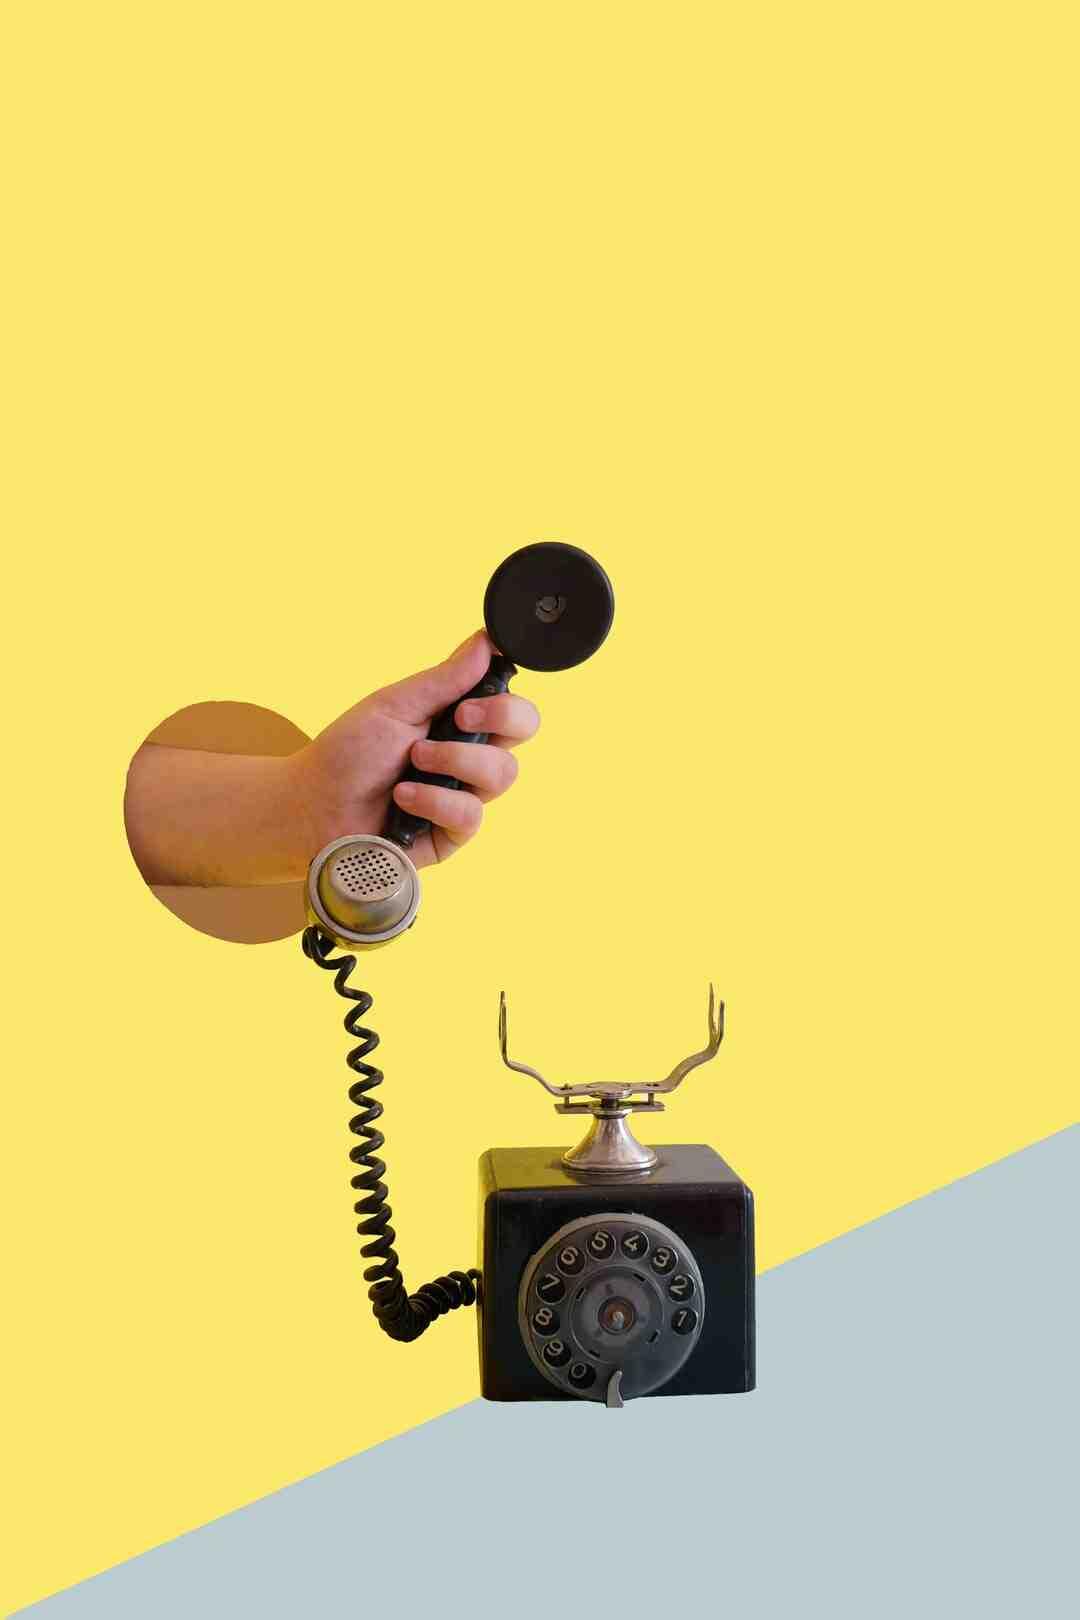 How do telephones work across oceans?